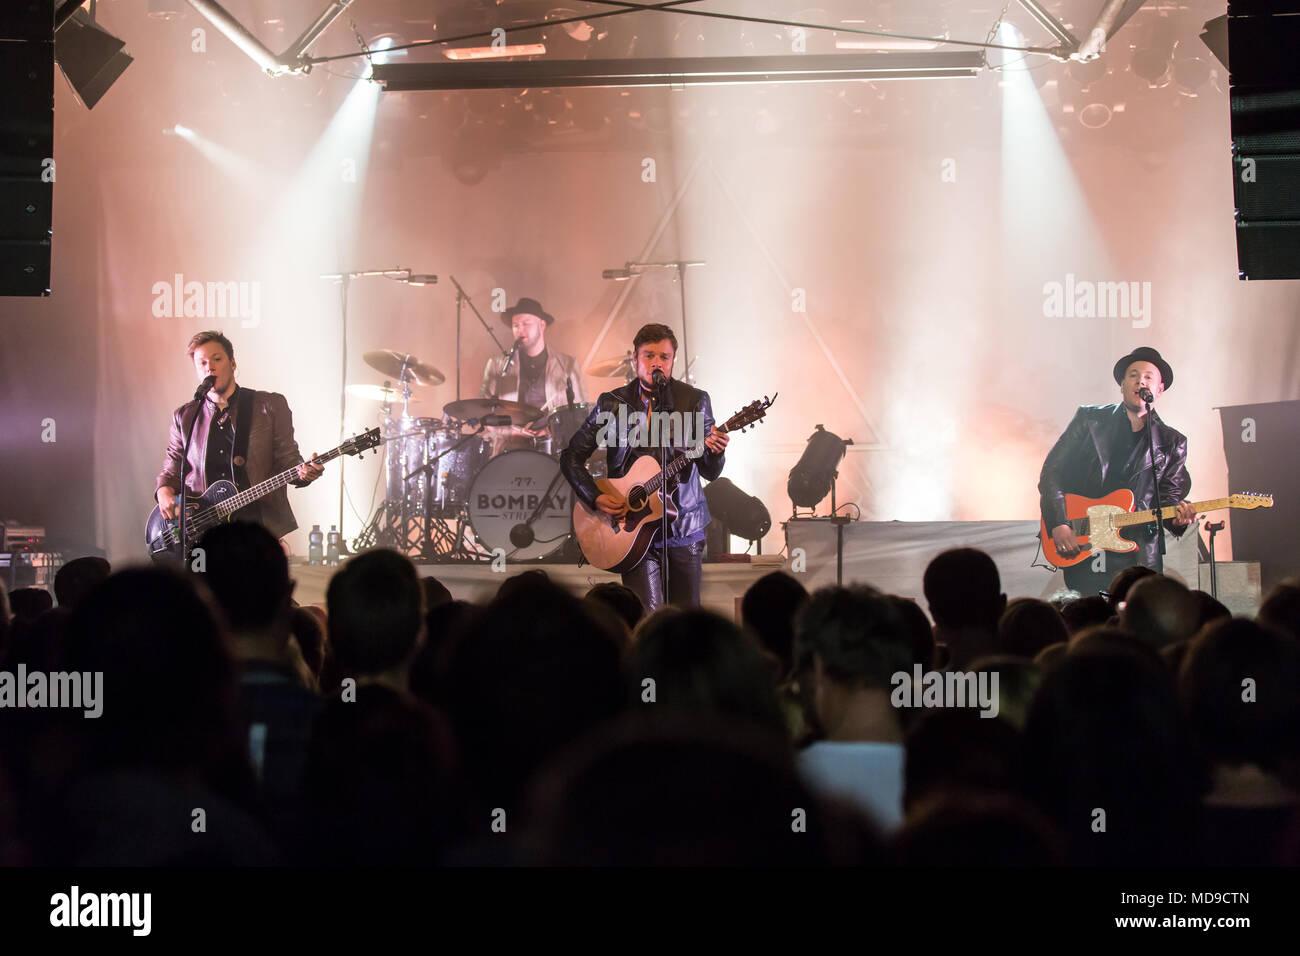 The Swiss Band 77 Bombay Street live at Schüür Luzern, Switzerland - Stock Image